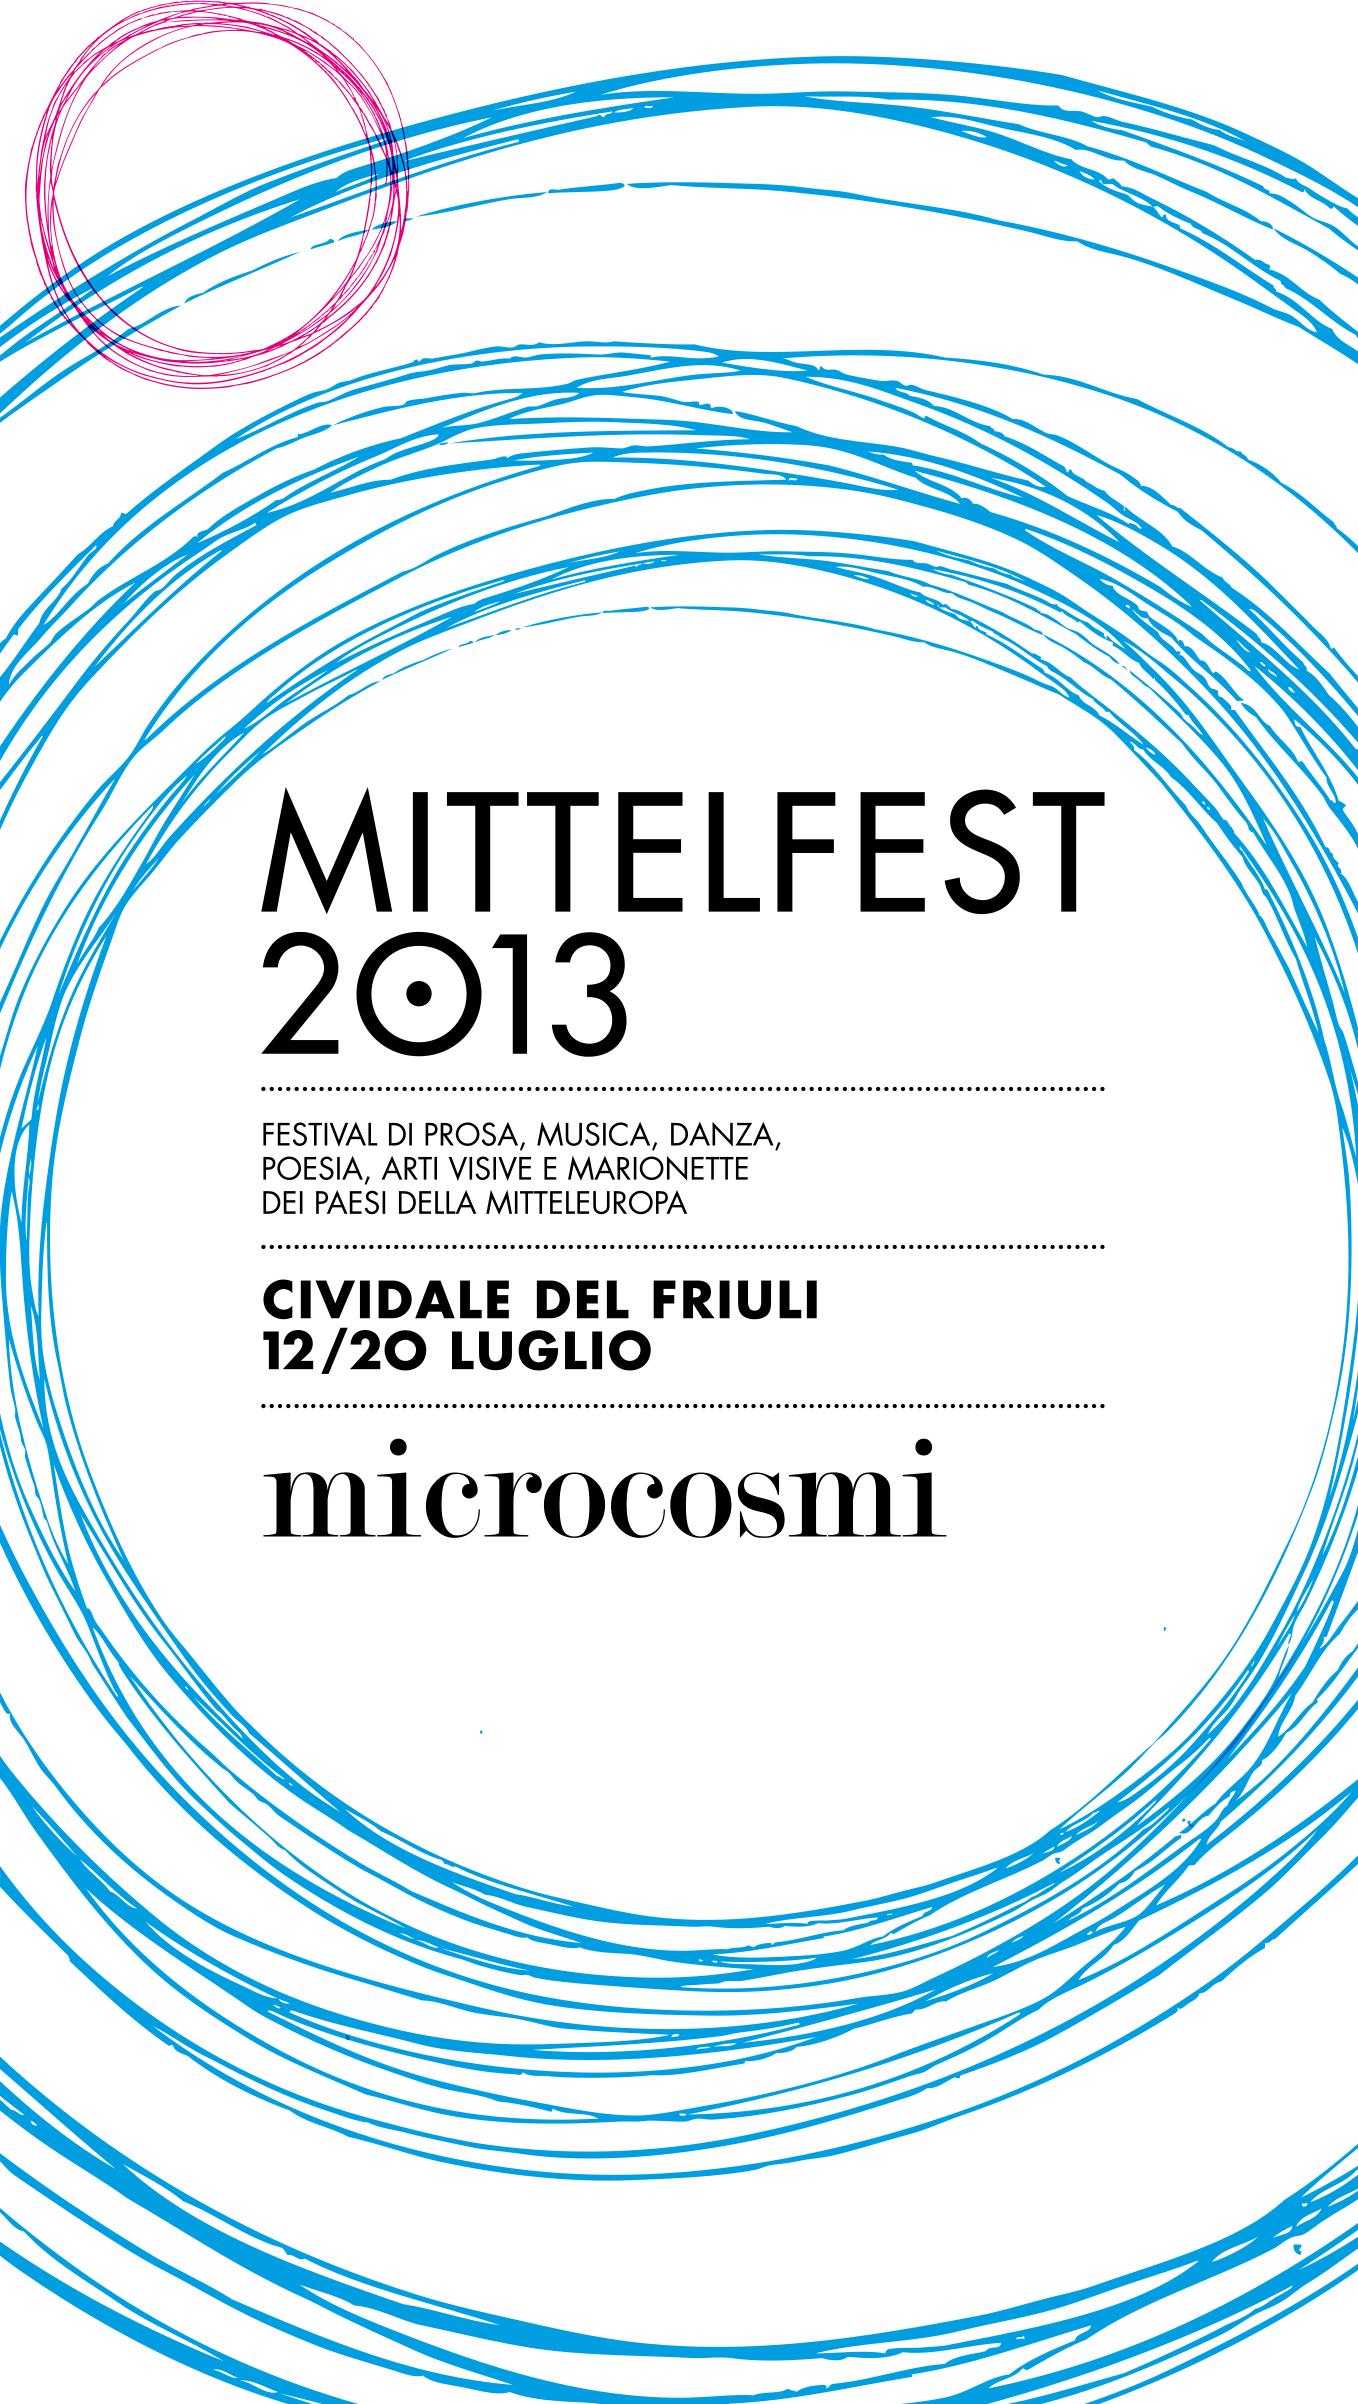 2013 Microcosmi